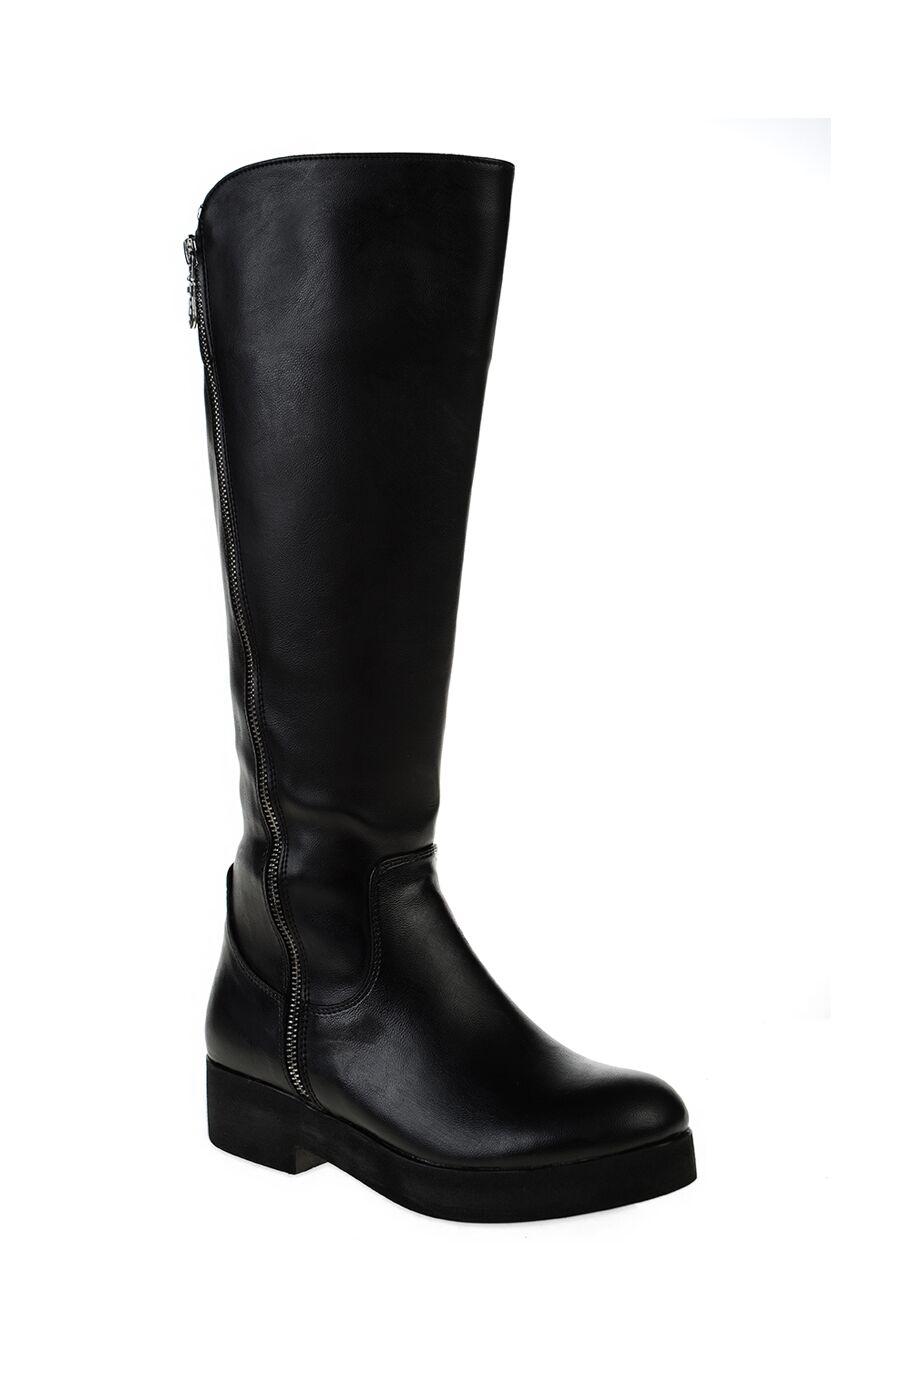 Dıvarese Siyah Fermuarlı Çizme – 149.0 TL